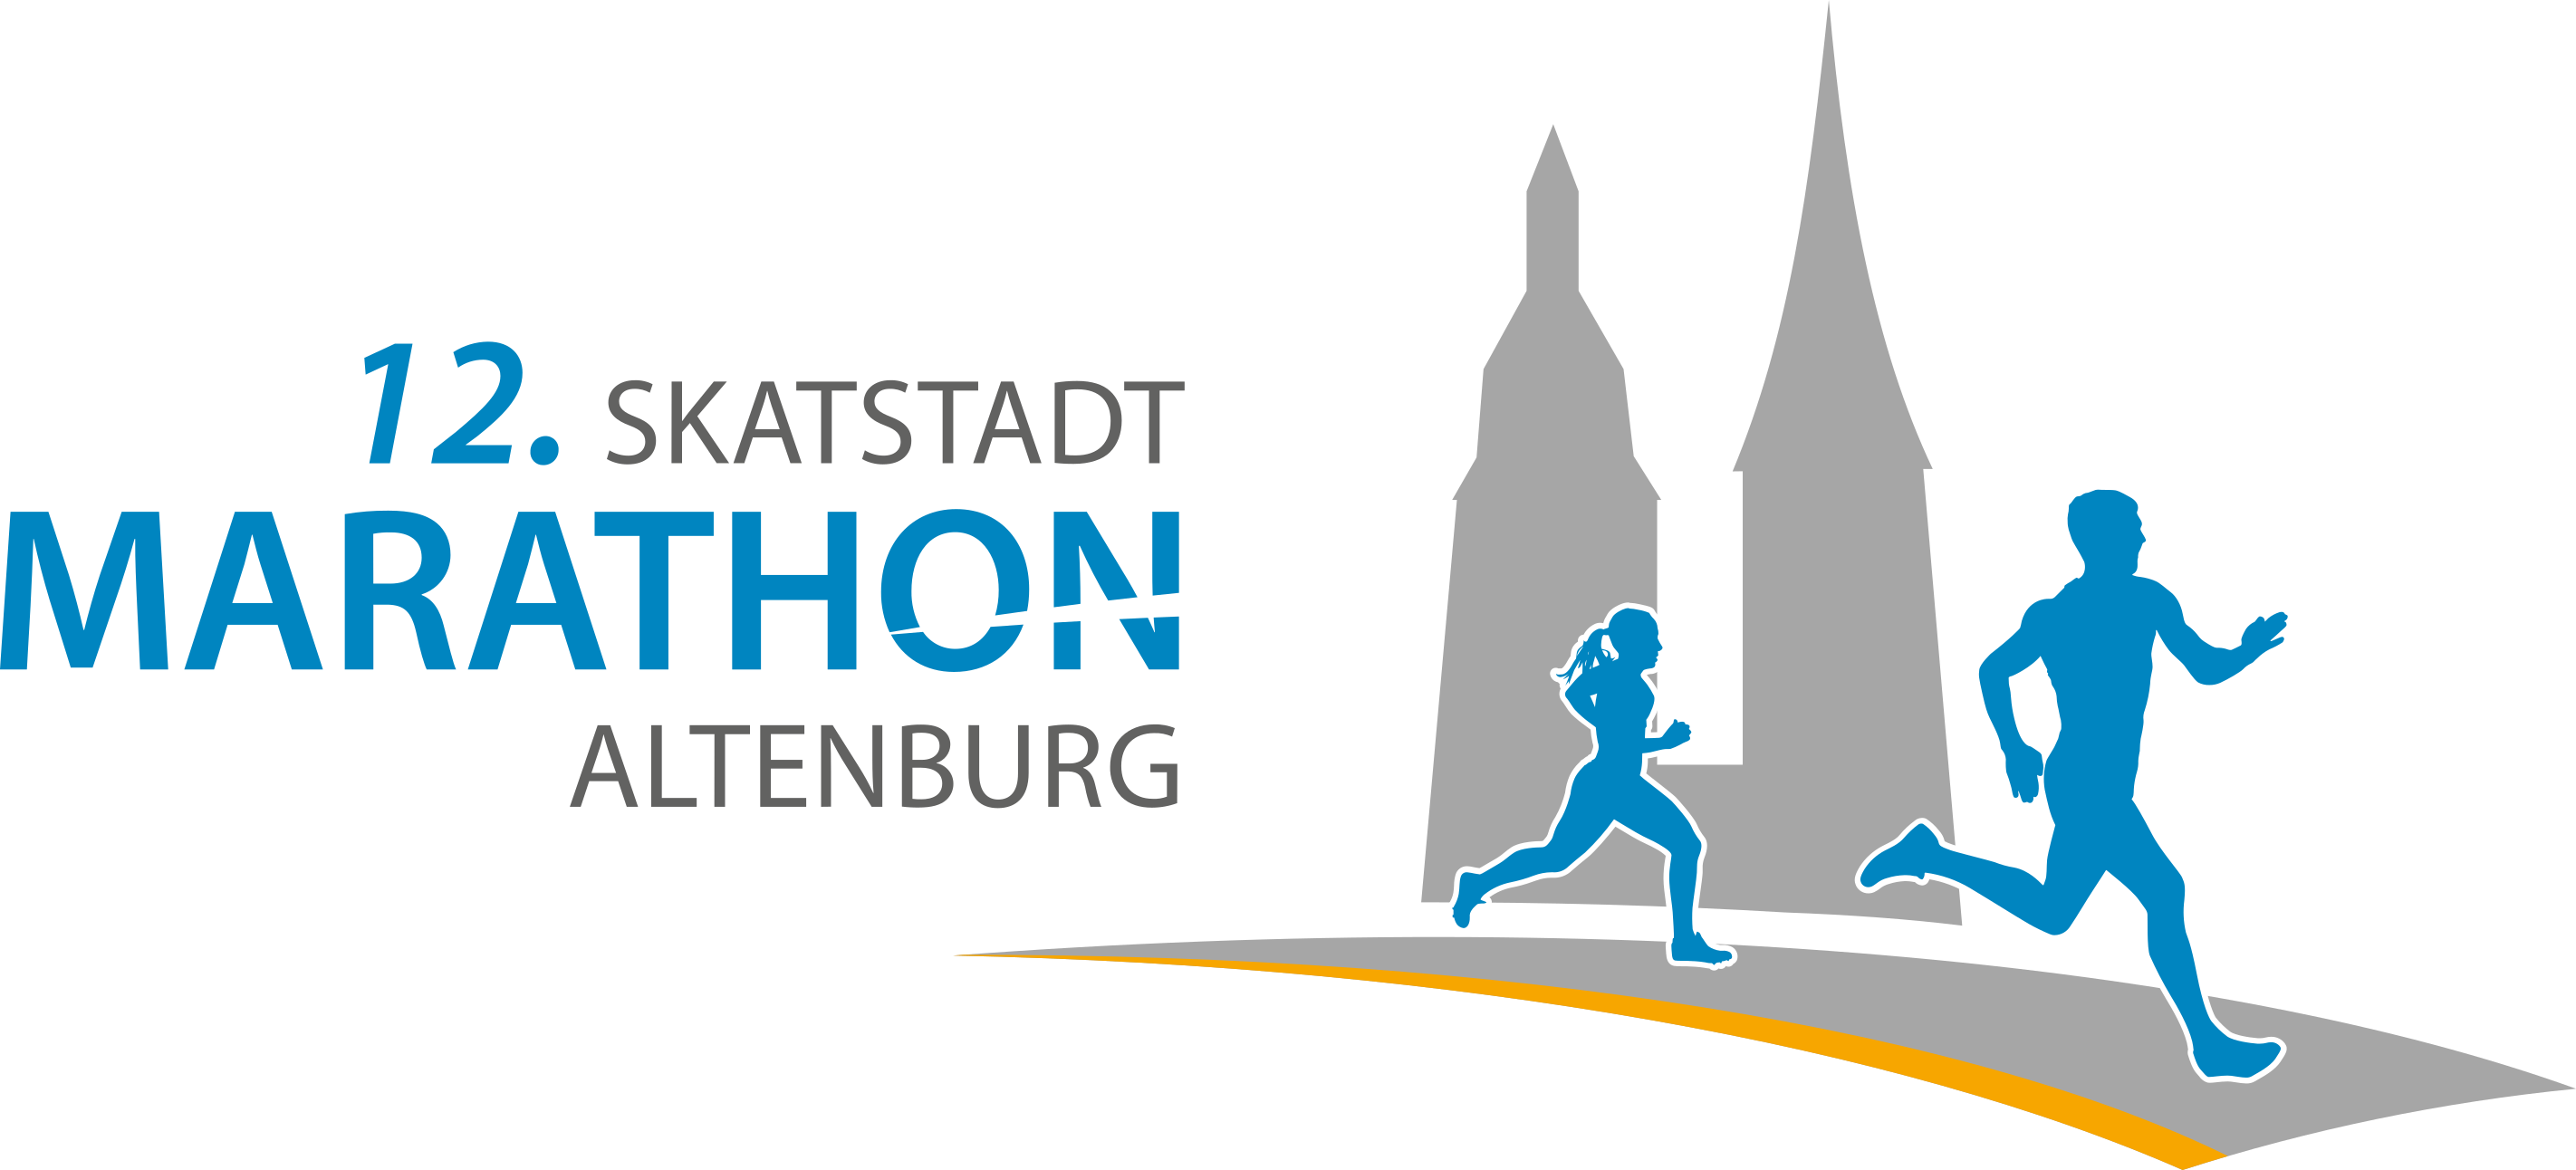 X-Alps vs. Skatstadtmarathon Altenburg